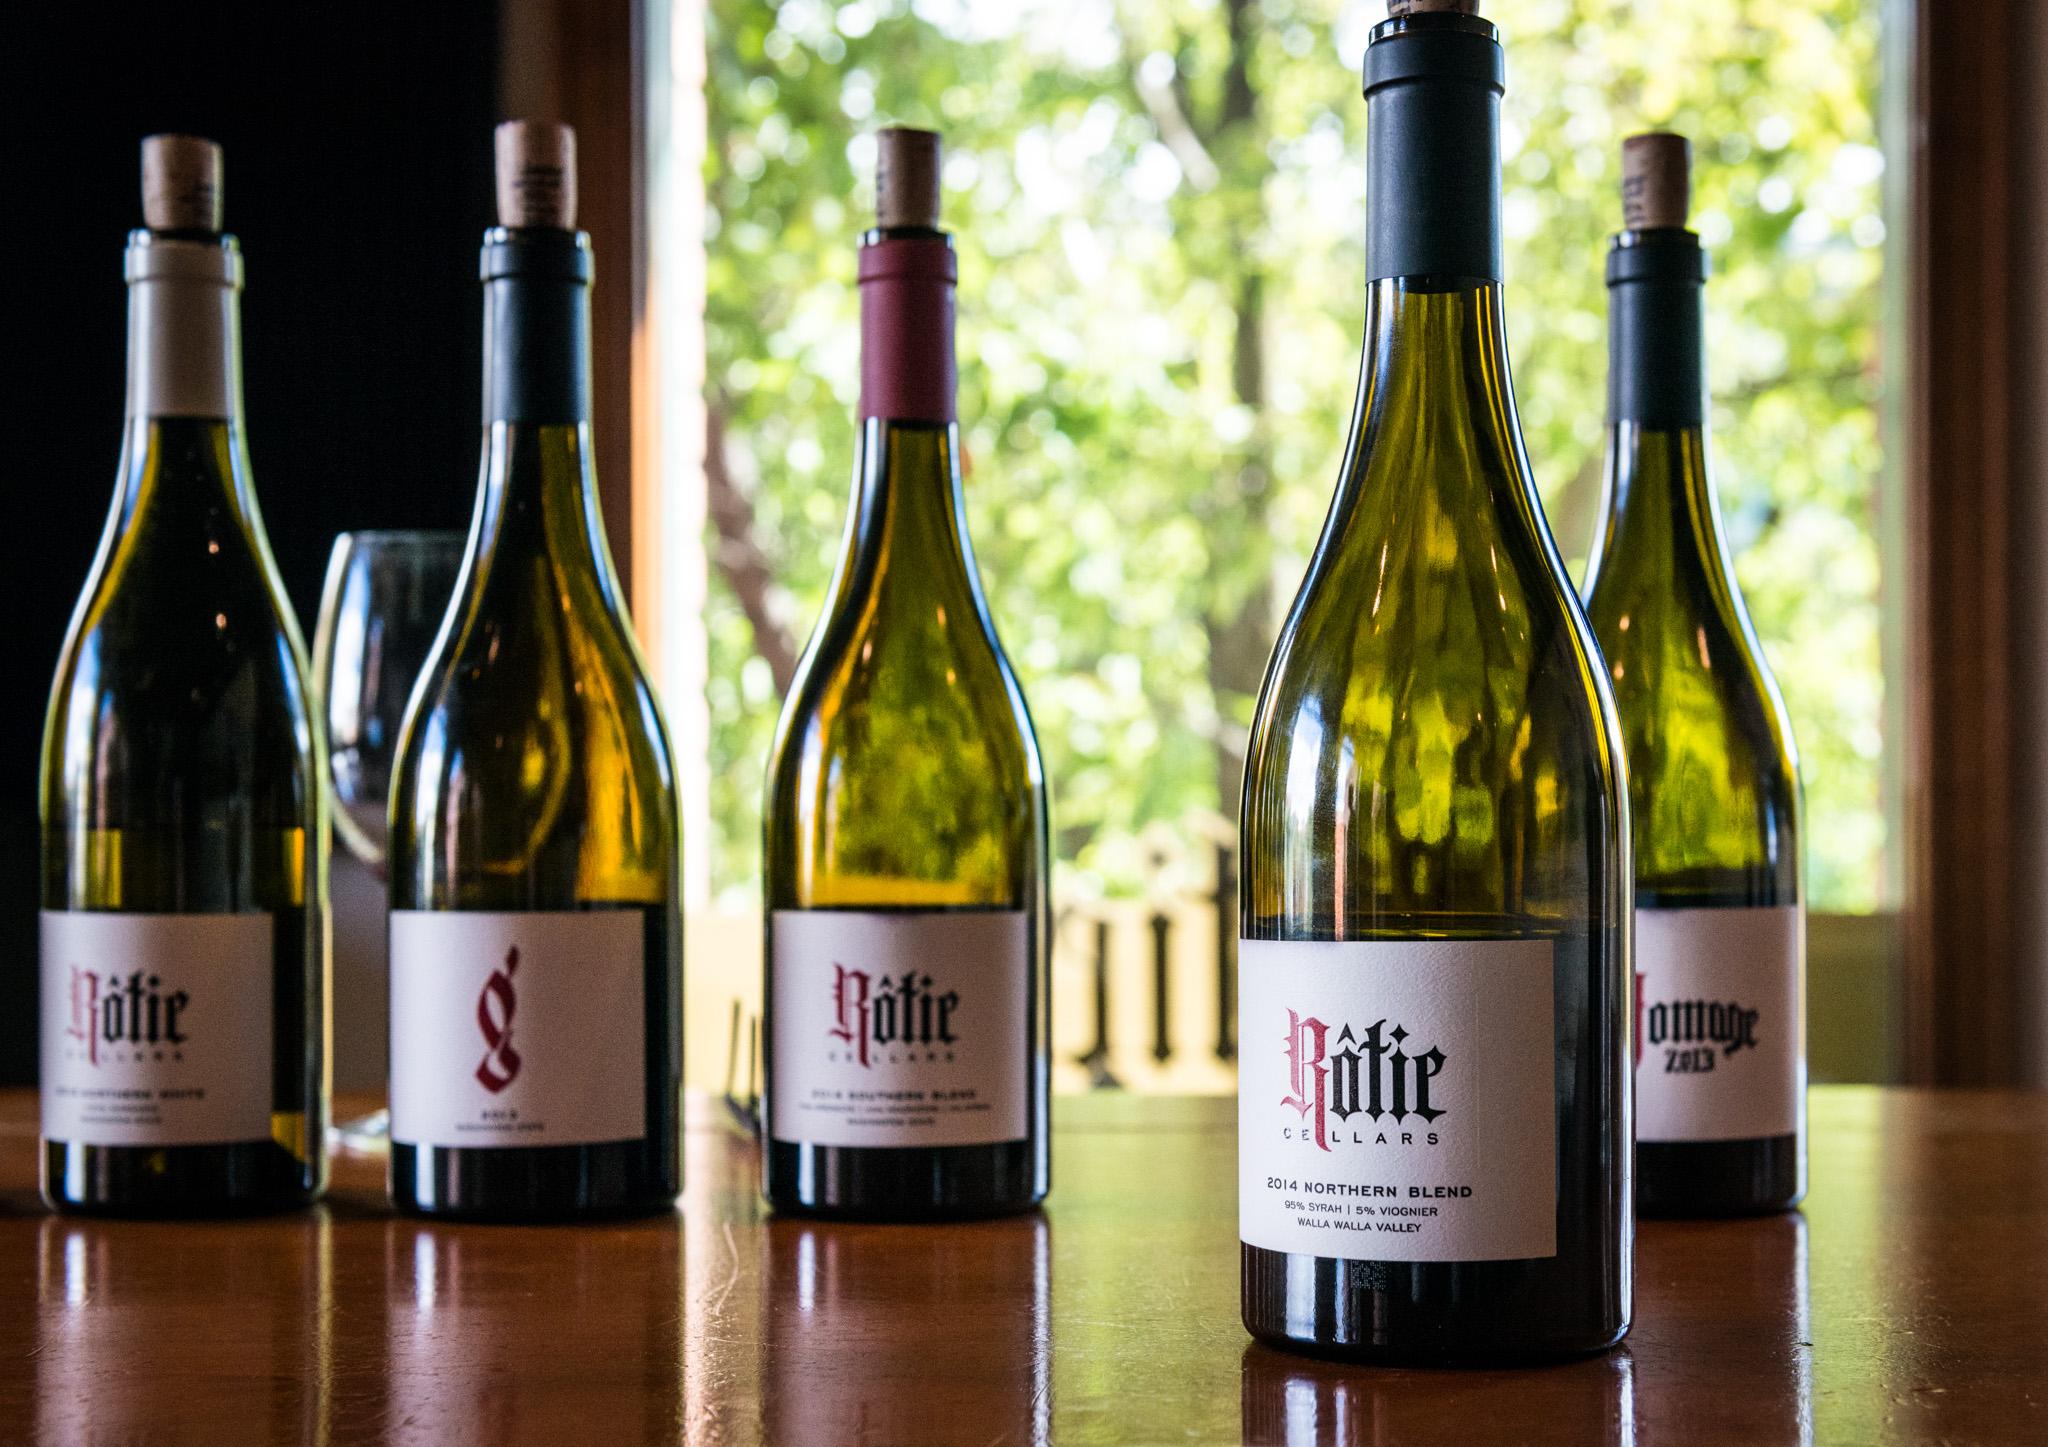 US : Washington : Rotie Cellars' Rhone-inspired wines